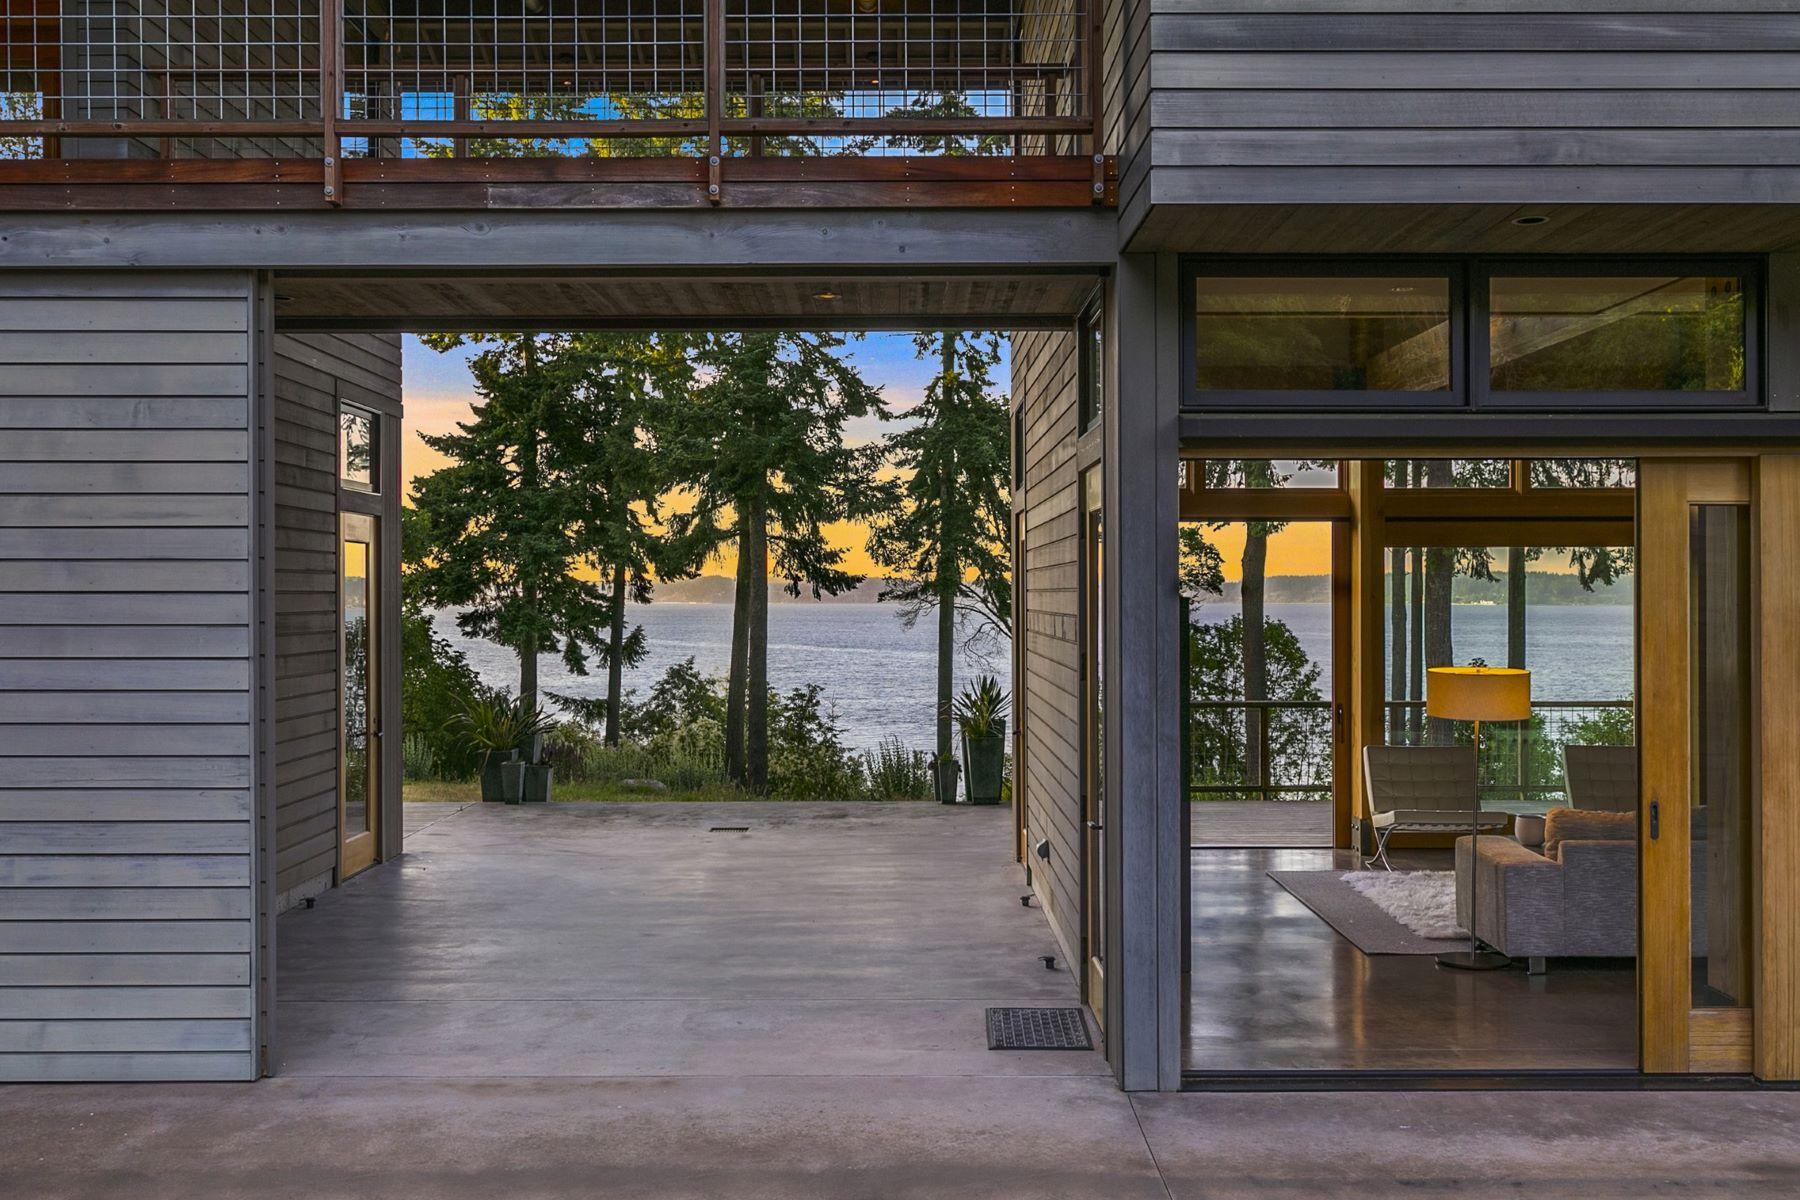 Additional photo for property listing at 4669 Saratoga Rd  Langley, Washington 98260 United States